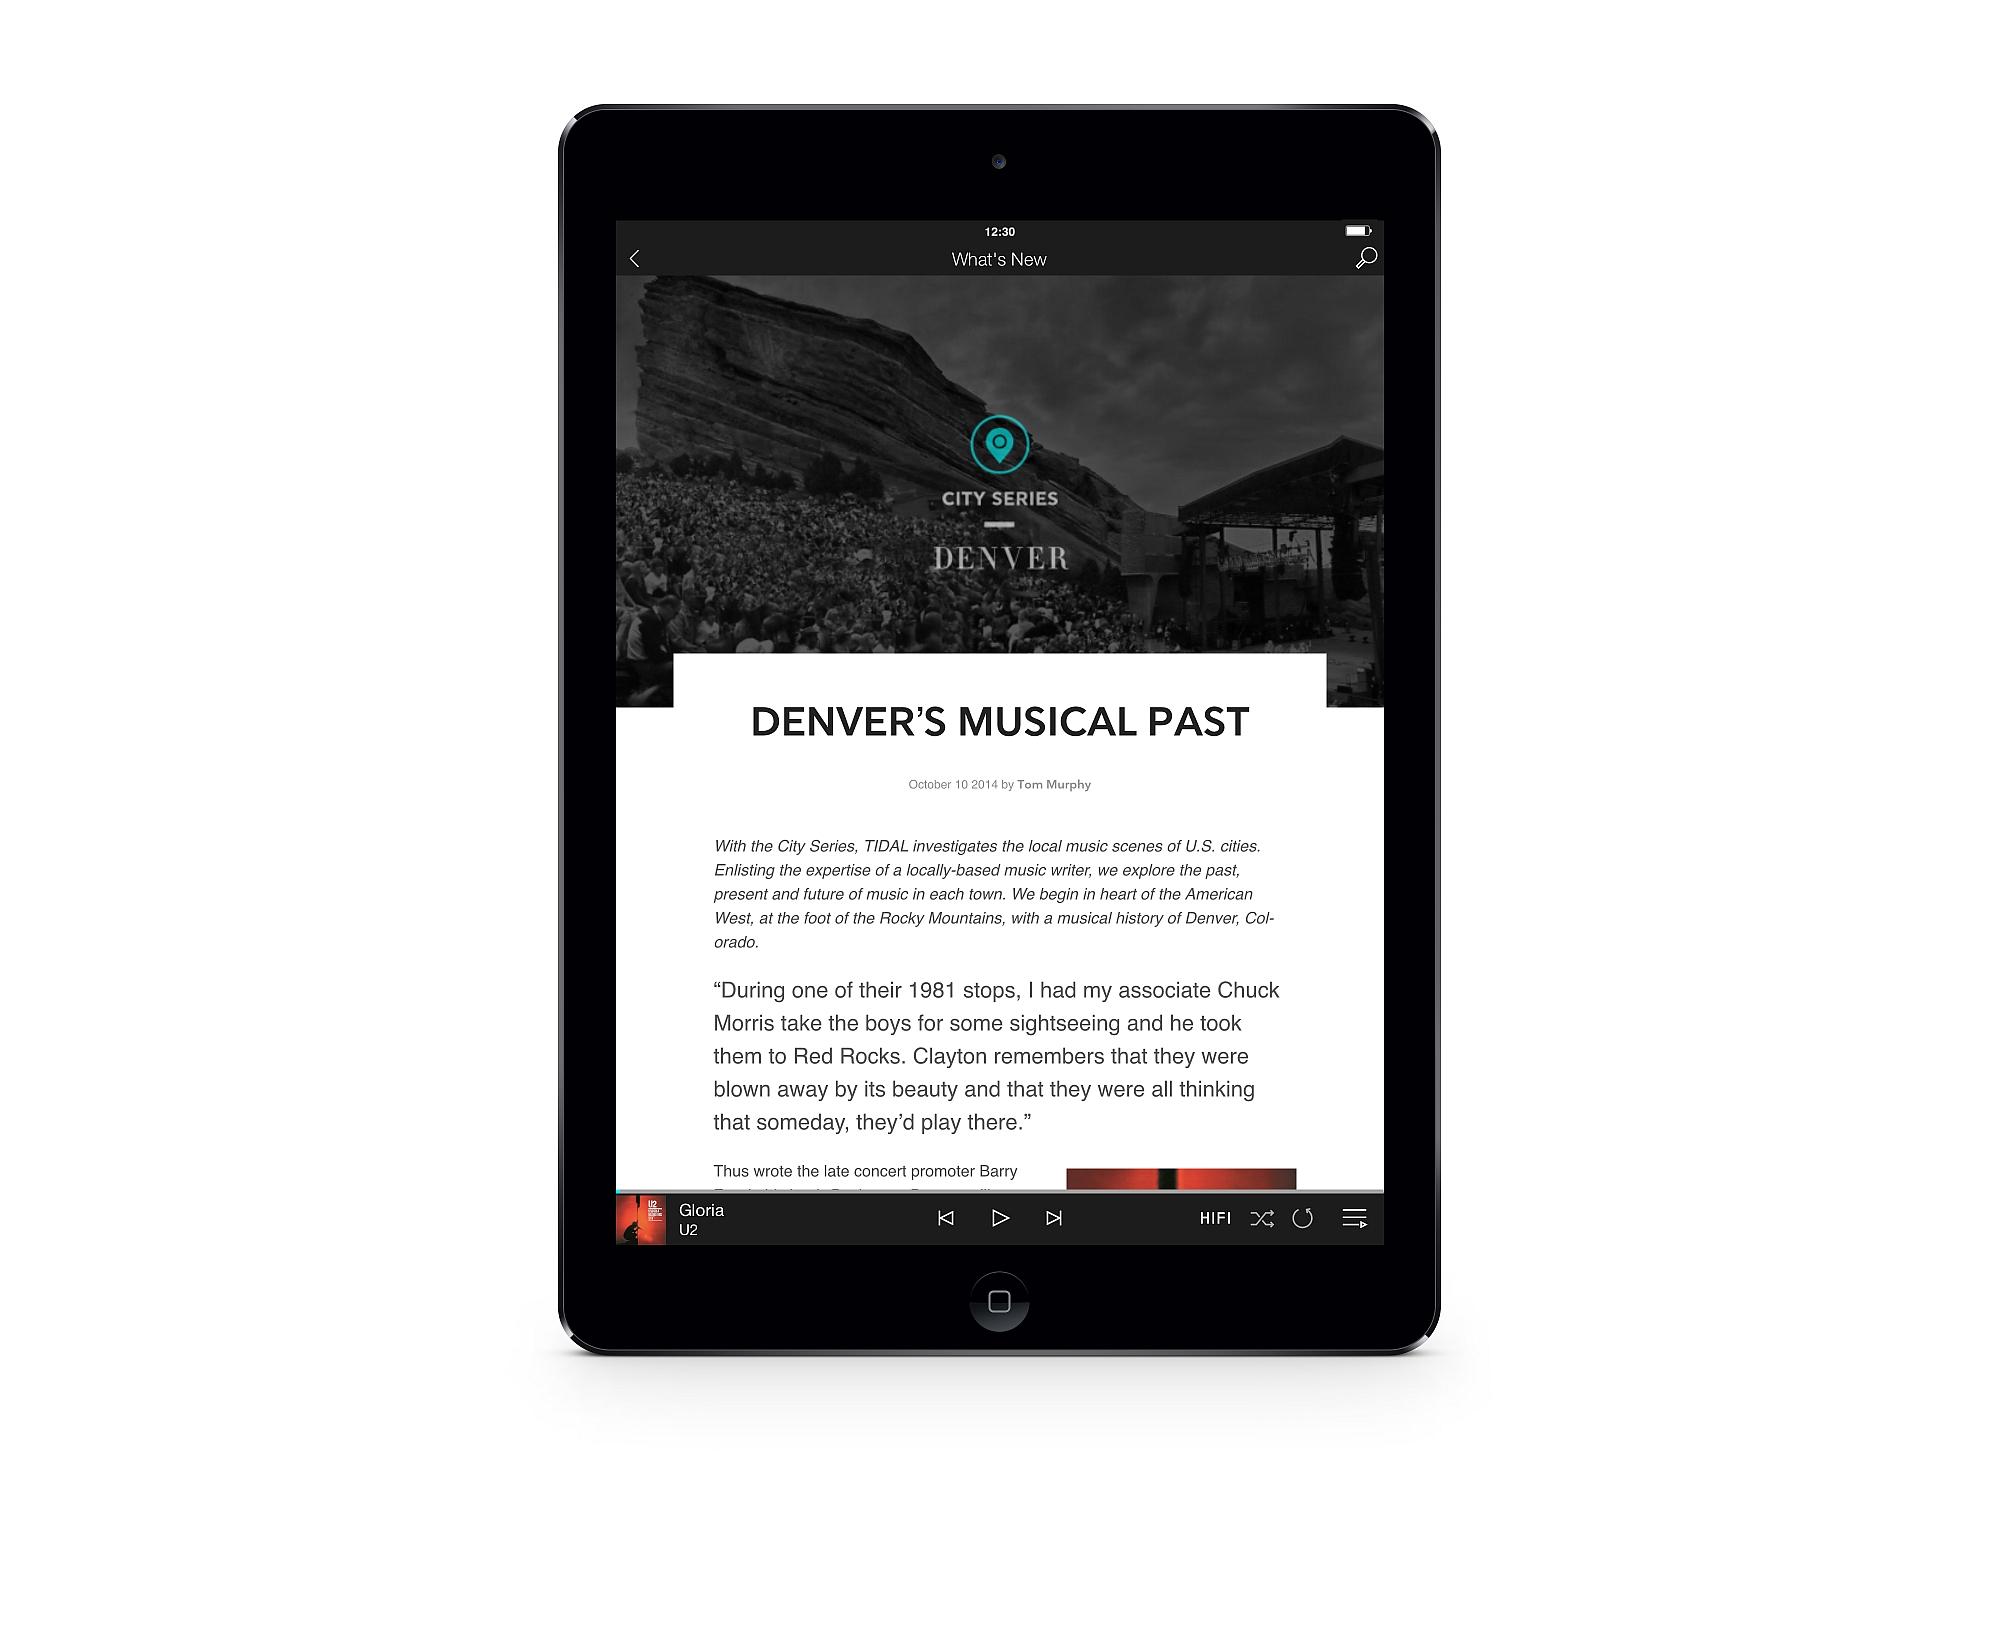 TIDAL_iOS_iPad_Article